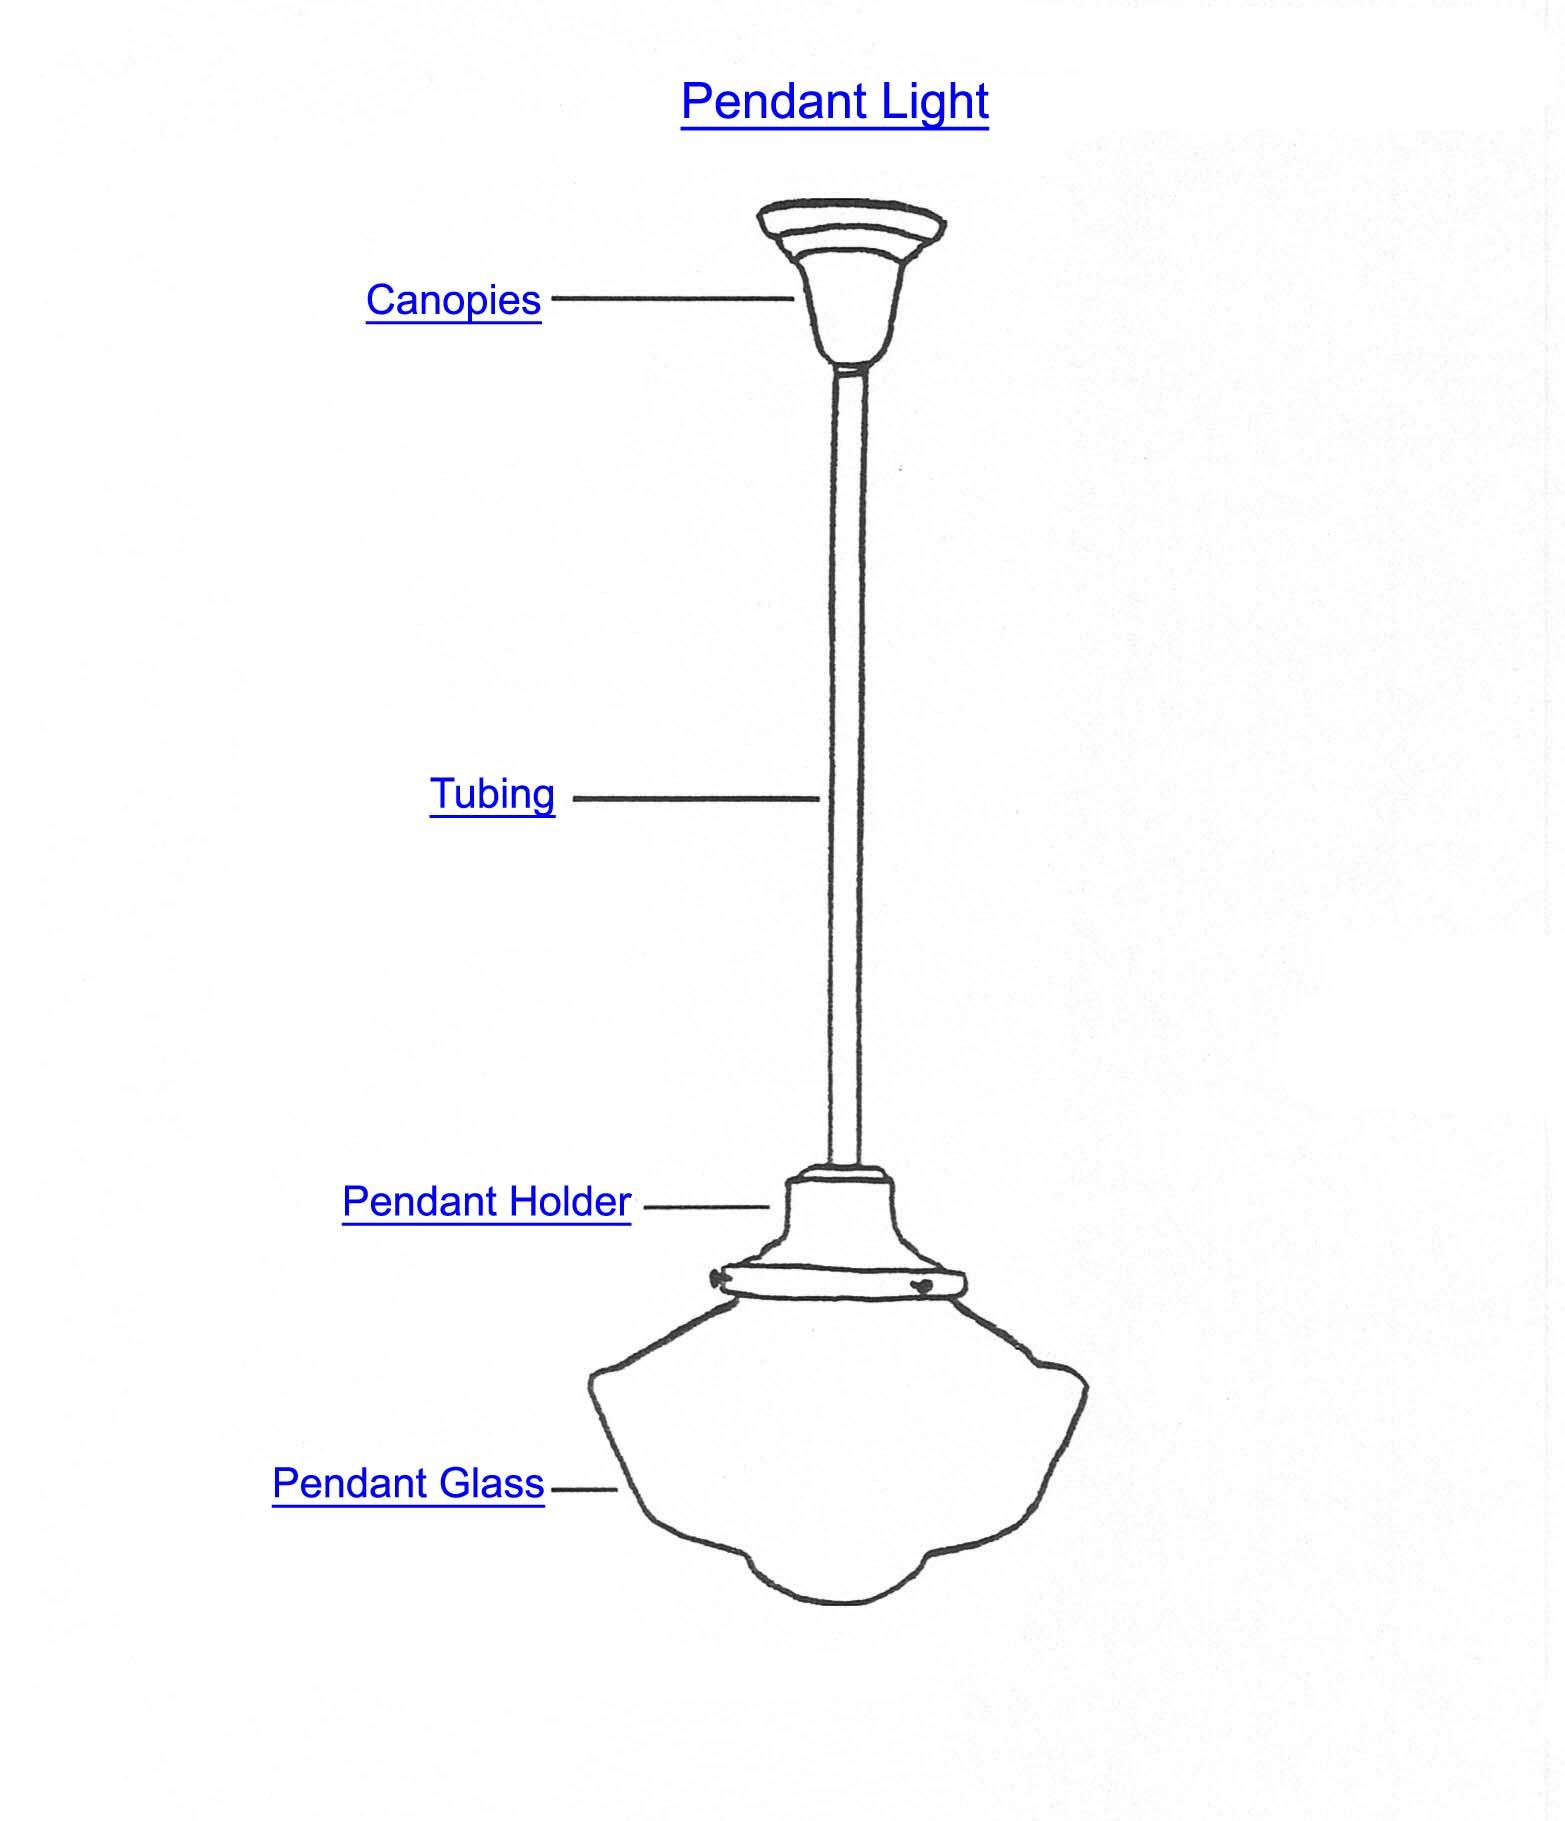 Pendant Lighting Part Index